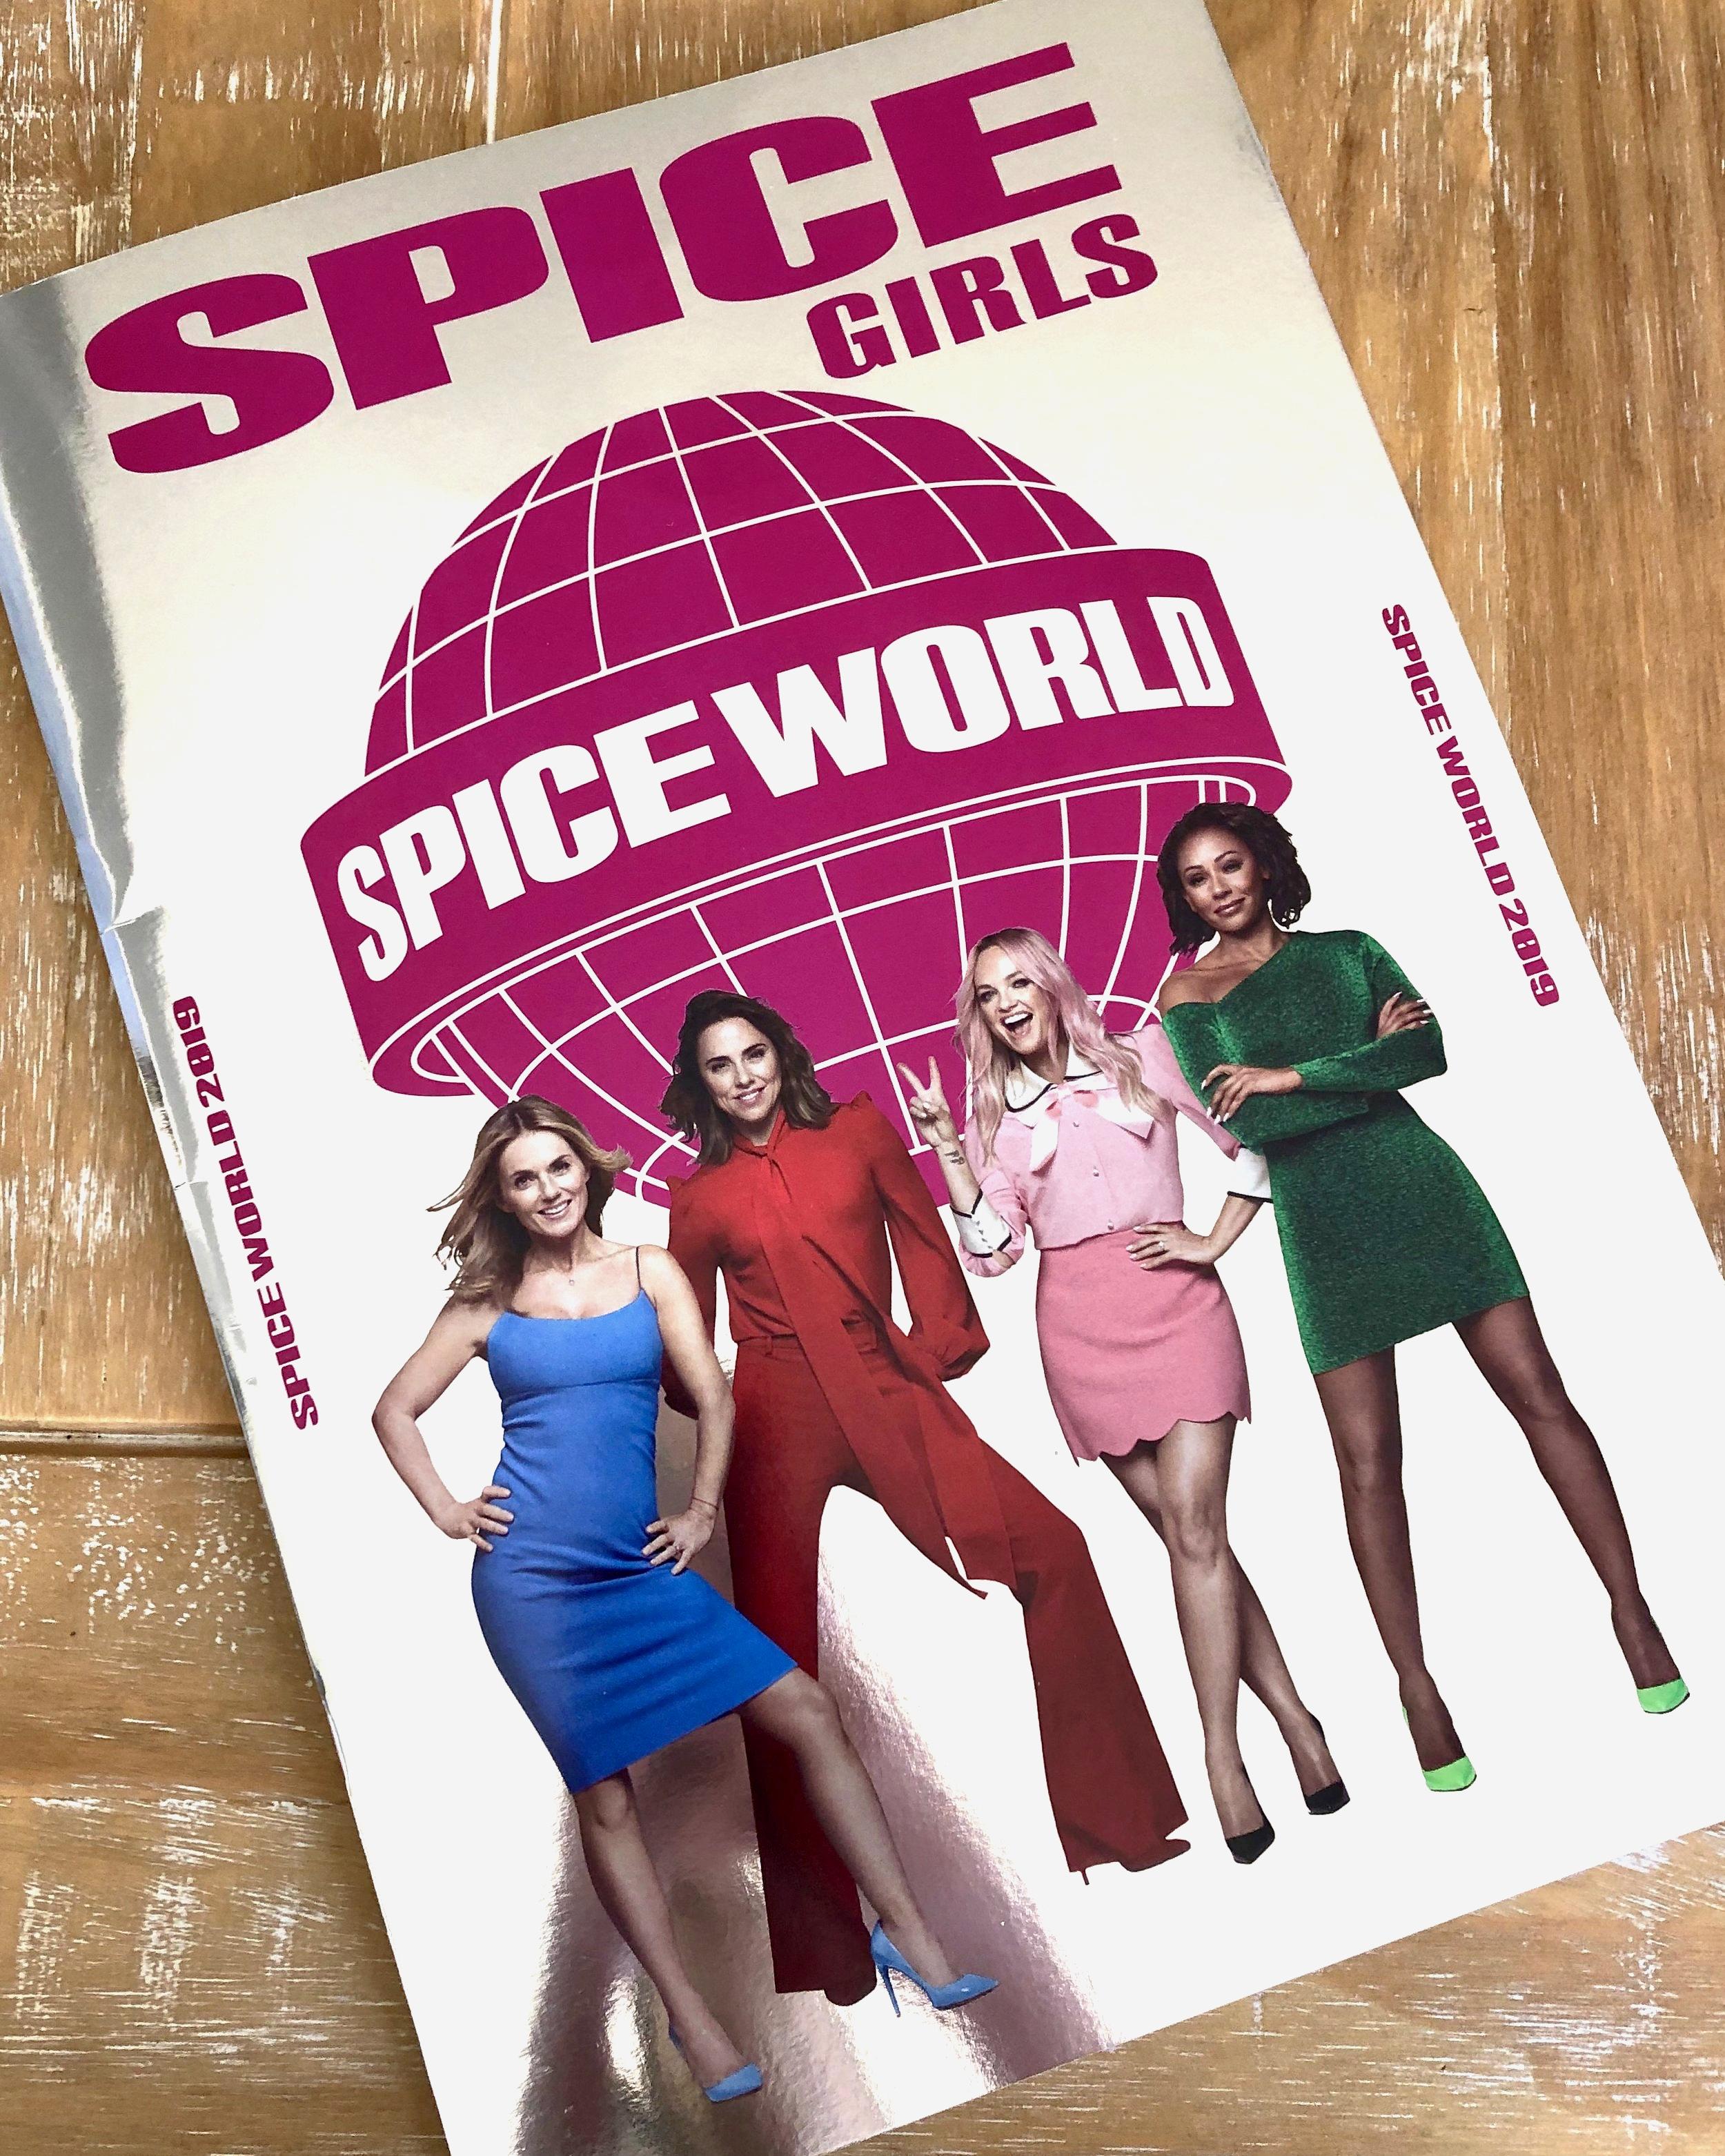 Spice Girls 5